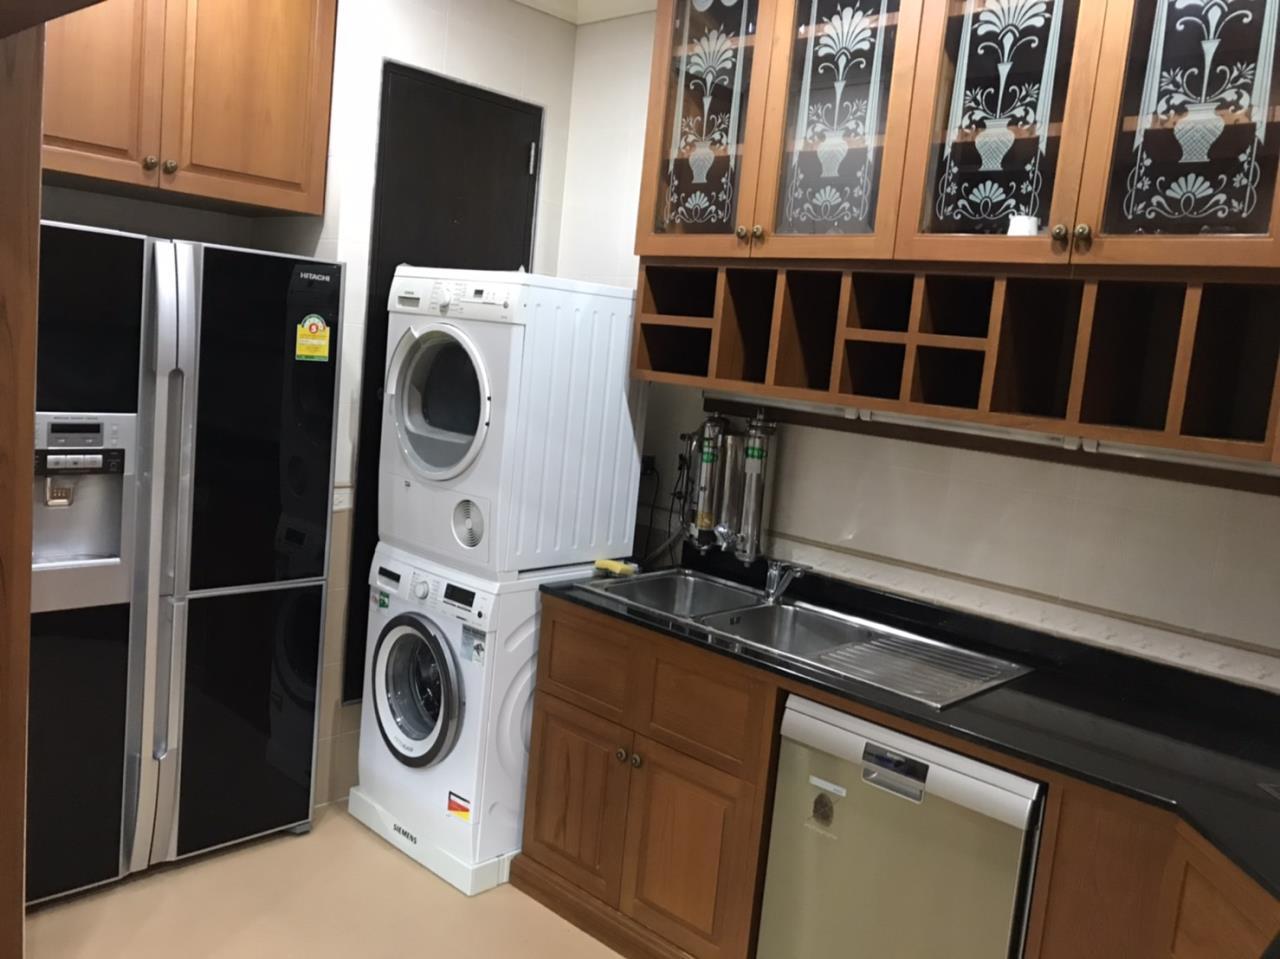 Blueocean property Agency's Condo For Rent – Condo Citismart Sukhumvit 18 3